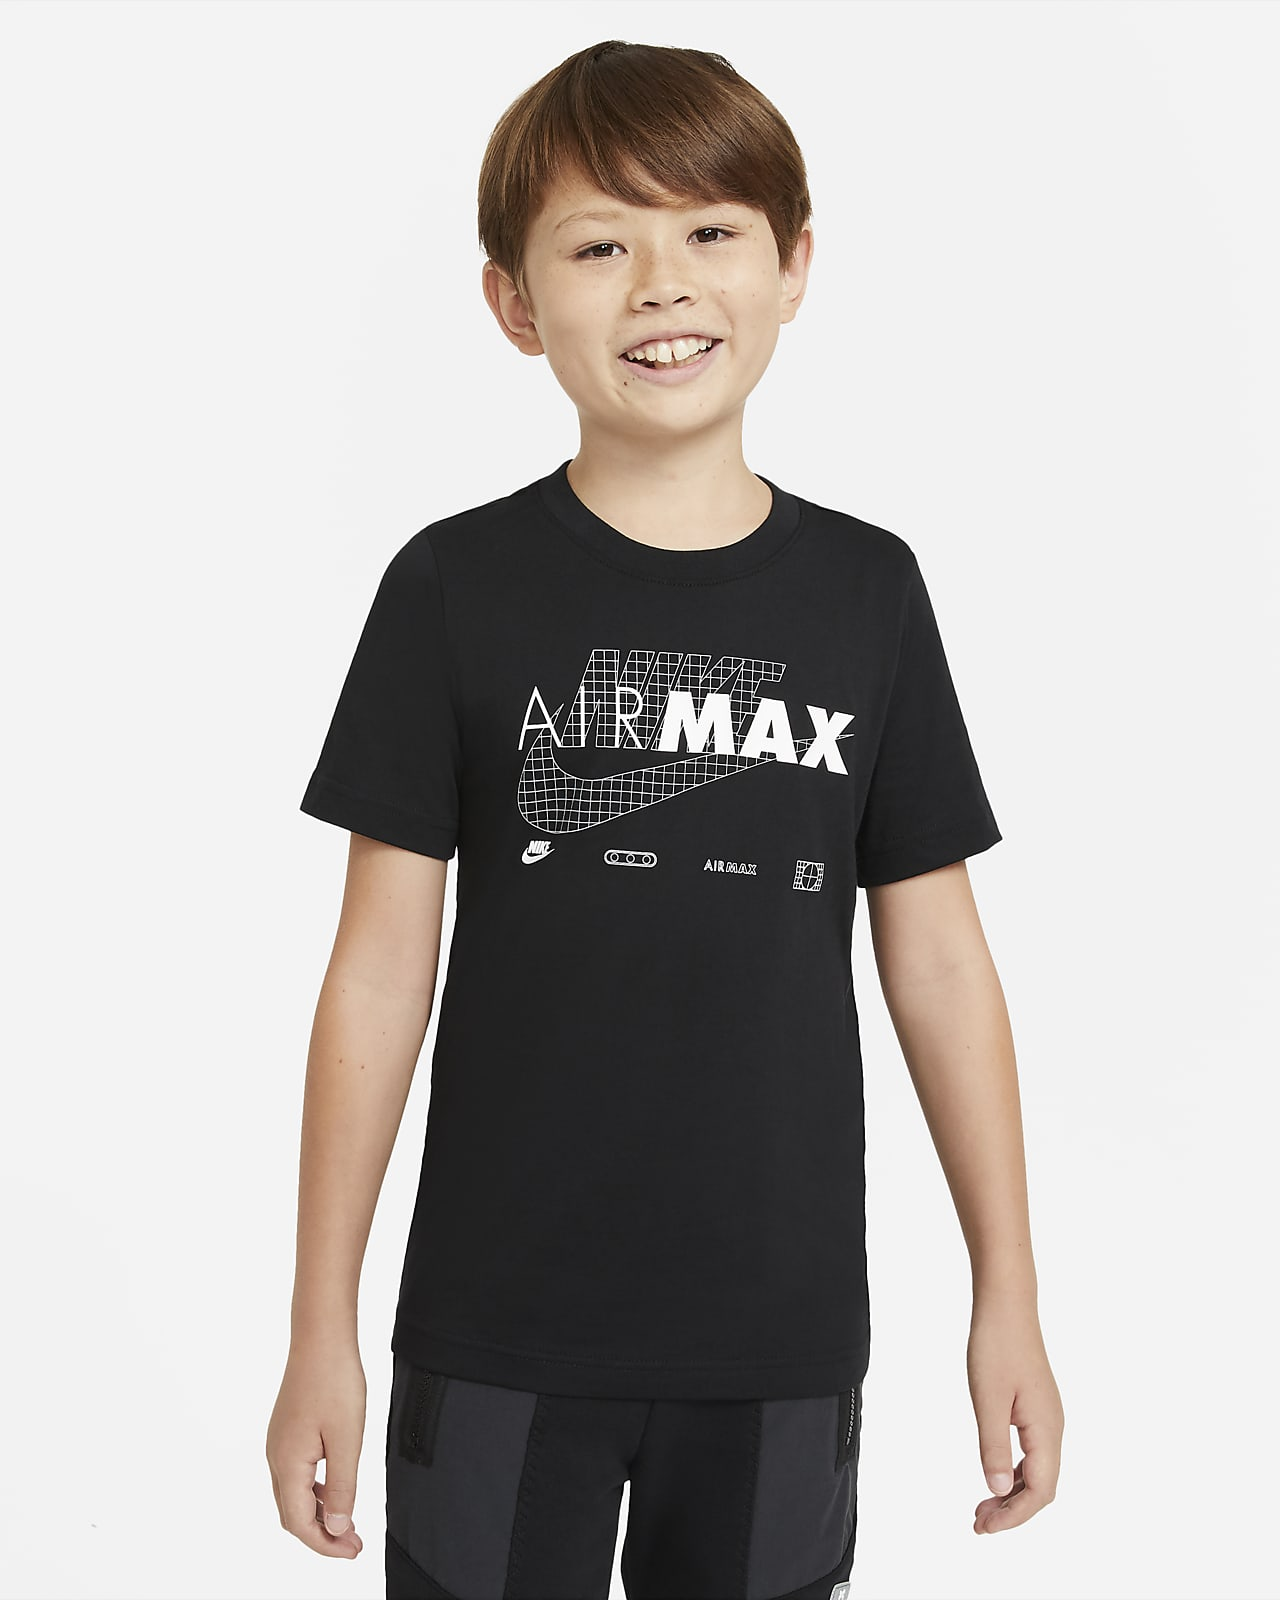 Nike Sportswear Air Max T-Shirt für ältere Kinder (Jungen)